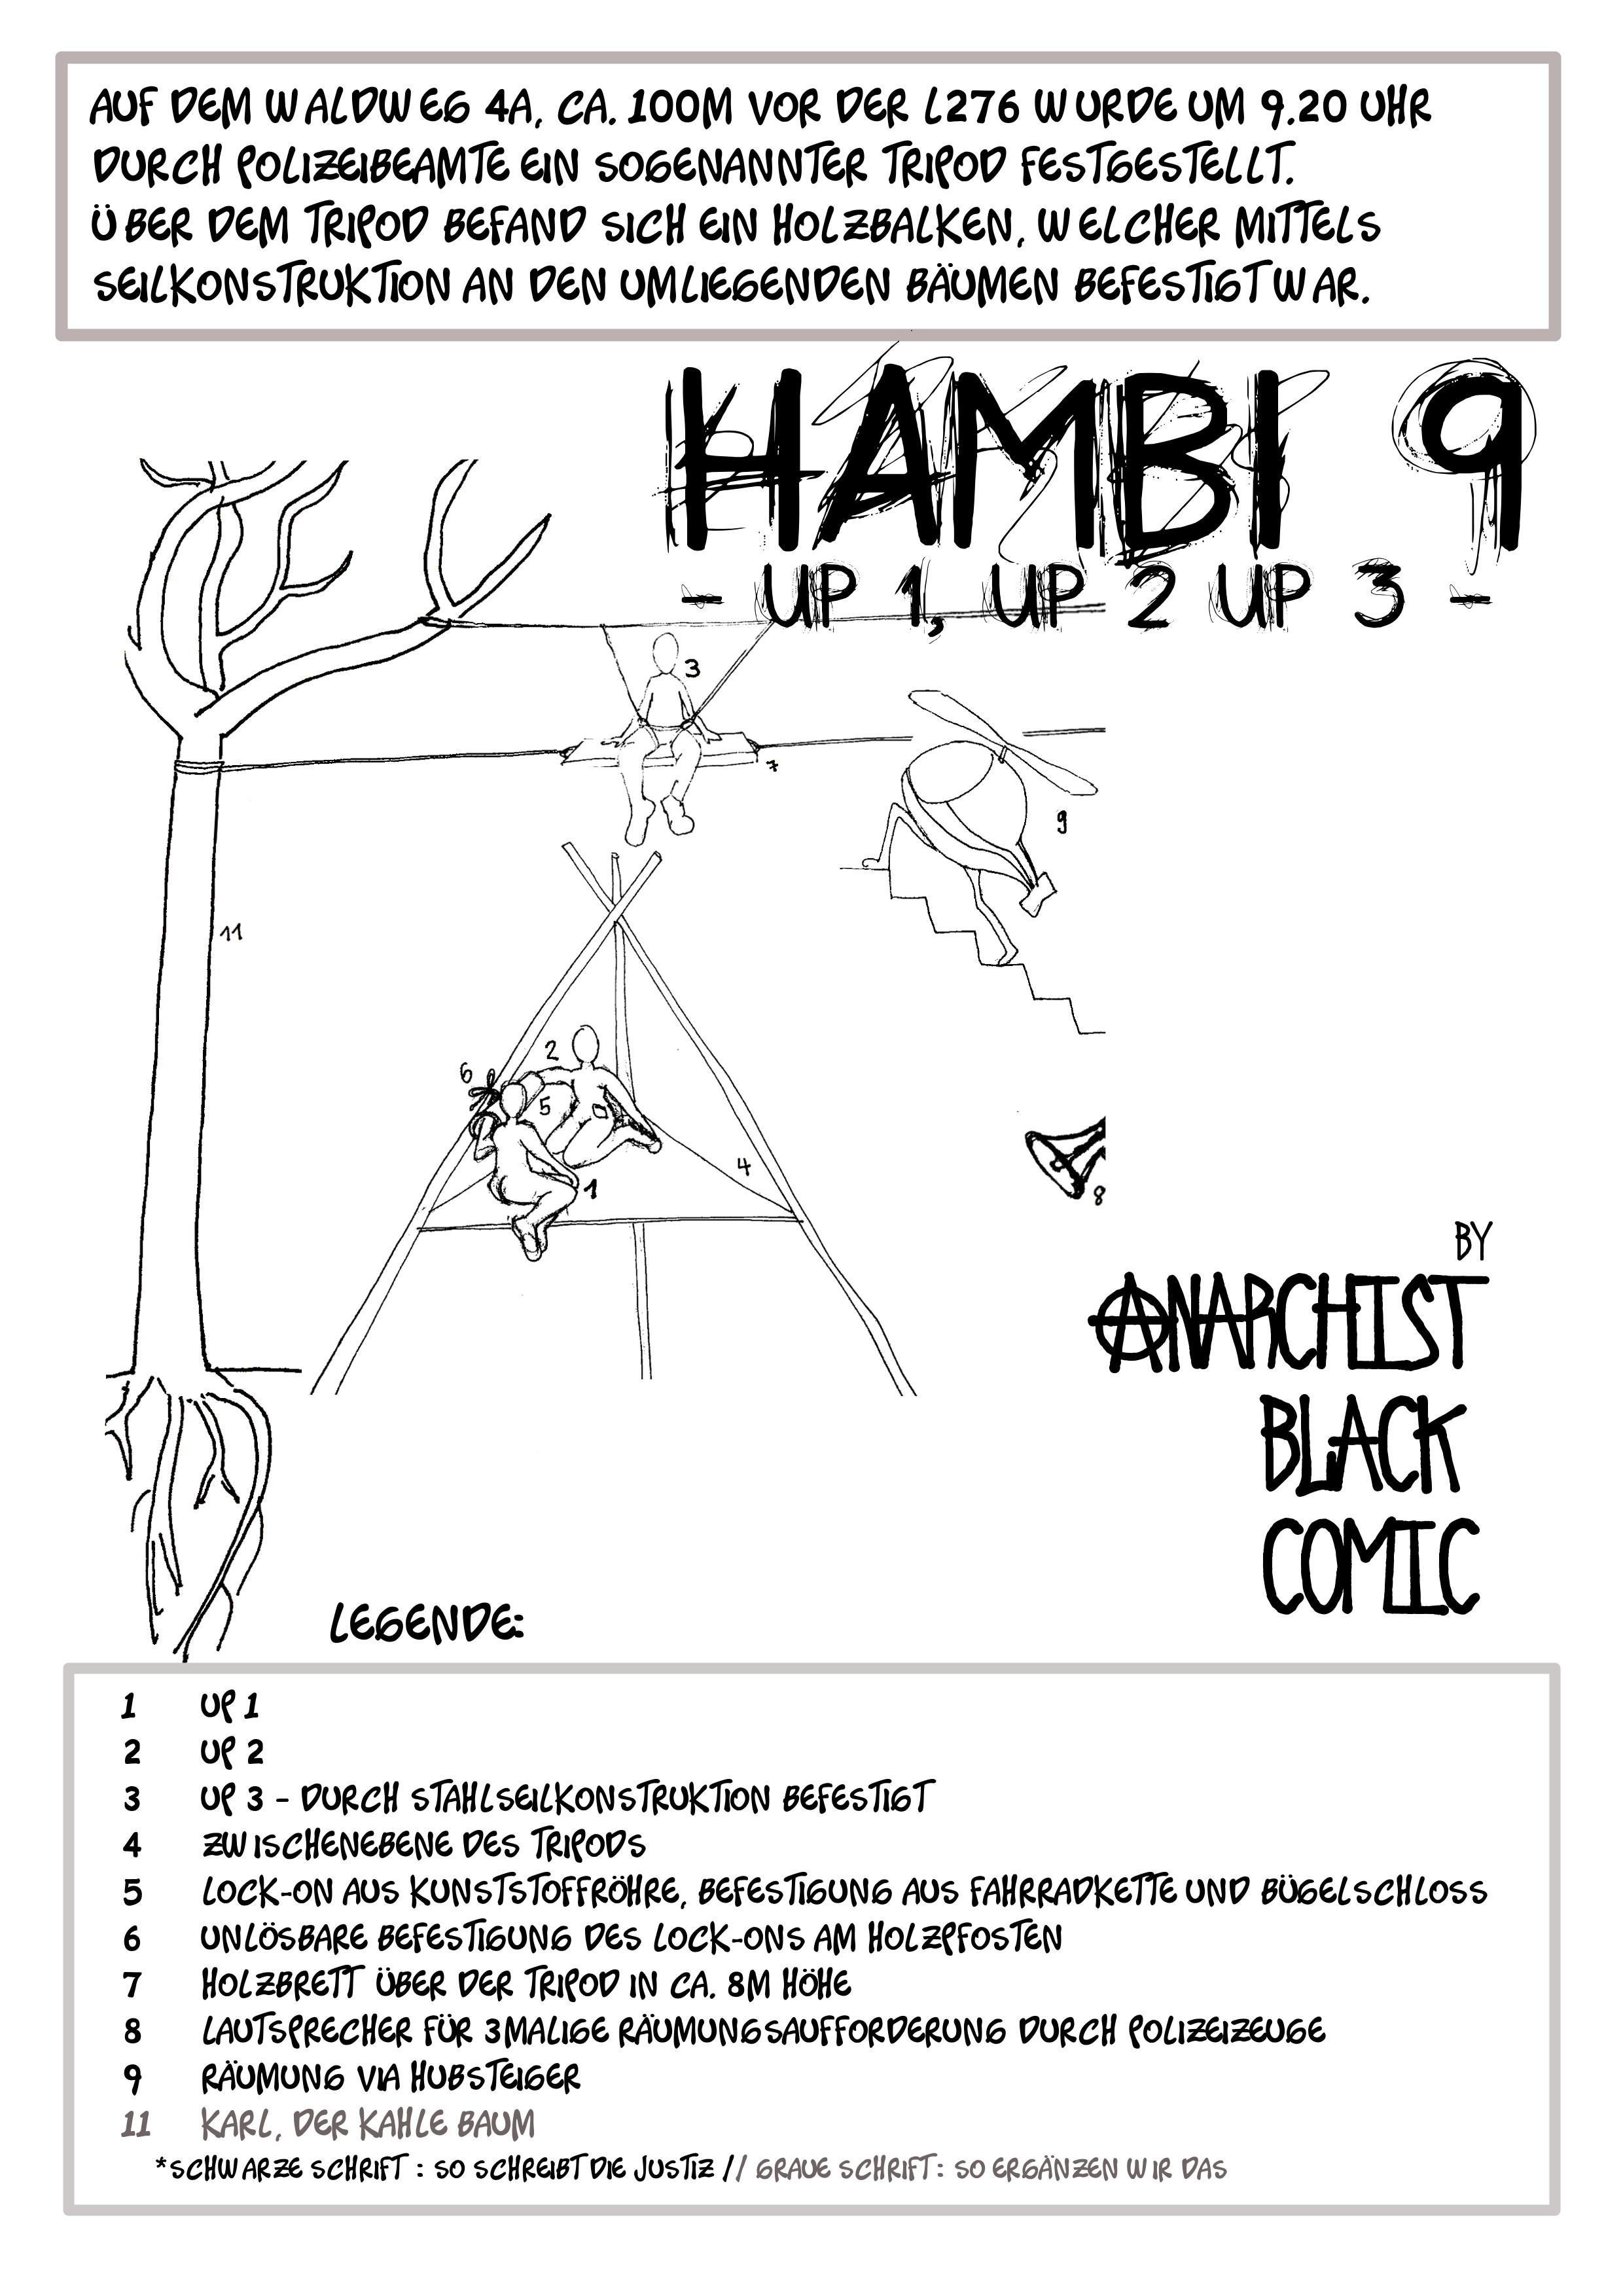 Anarchist Black Comic